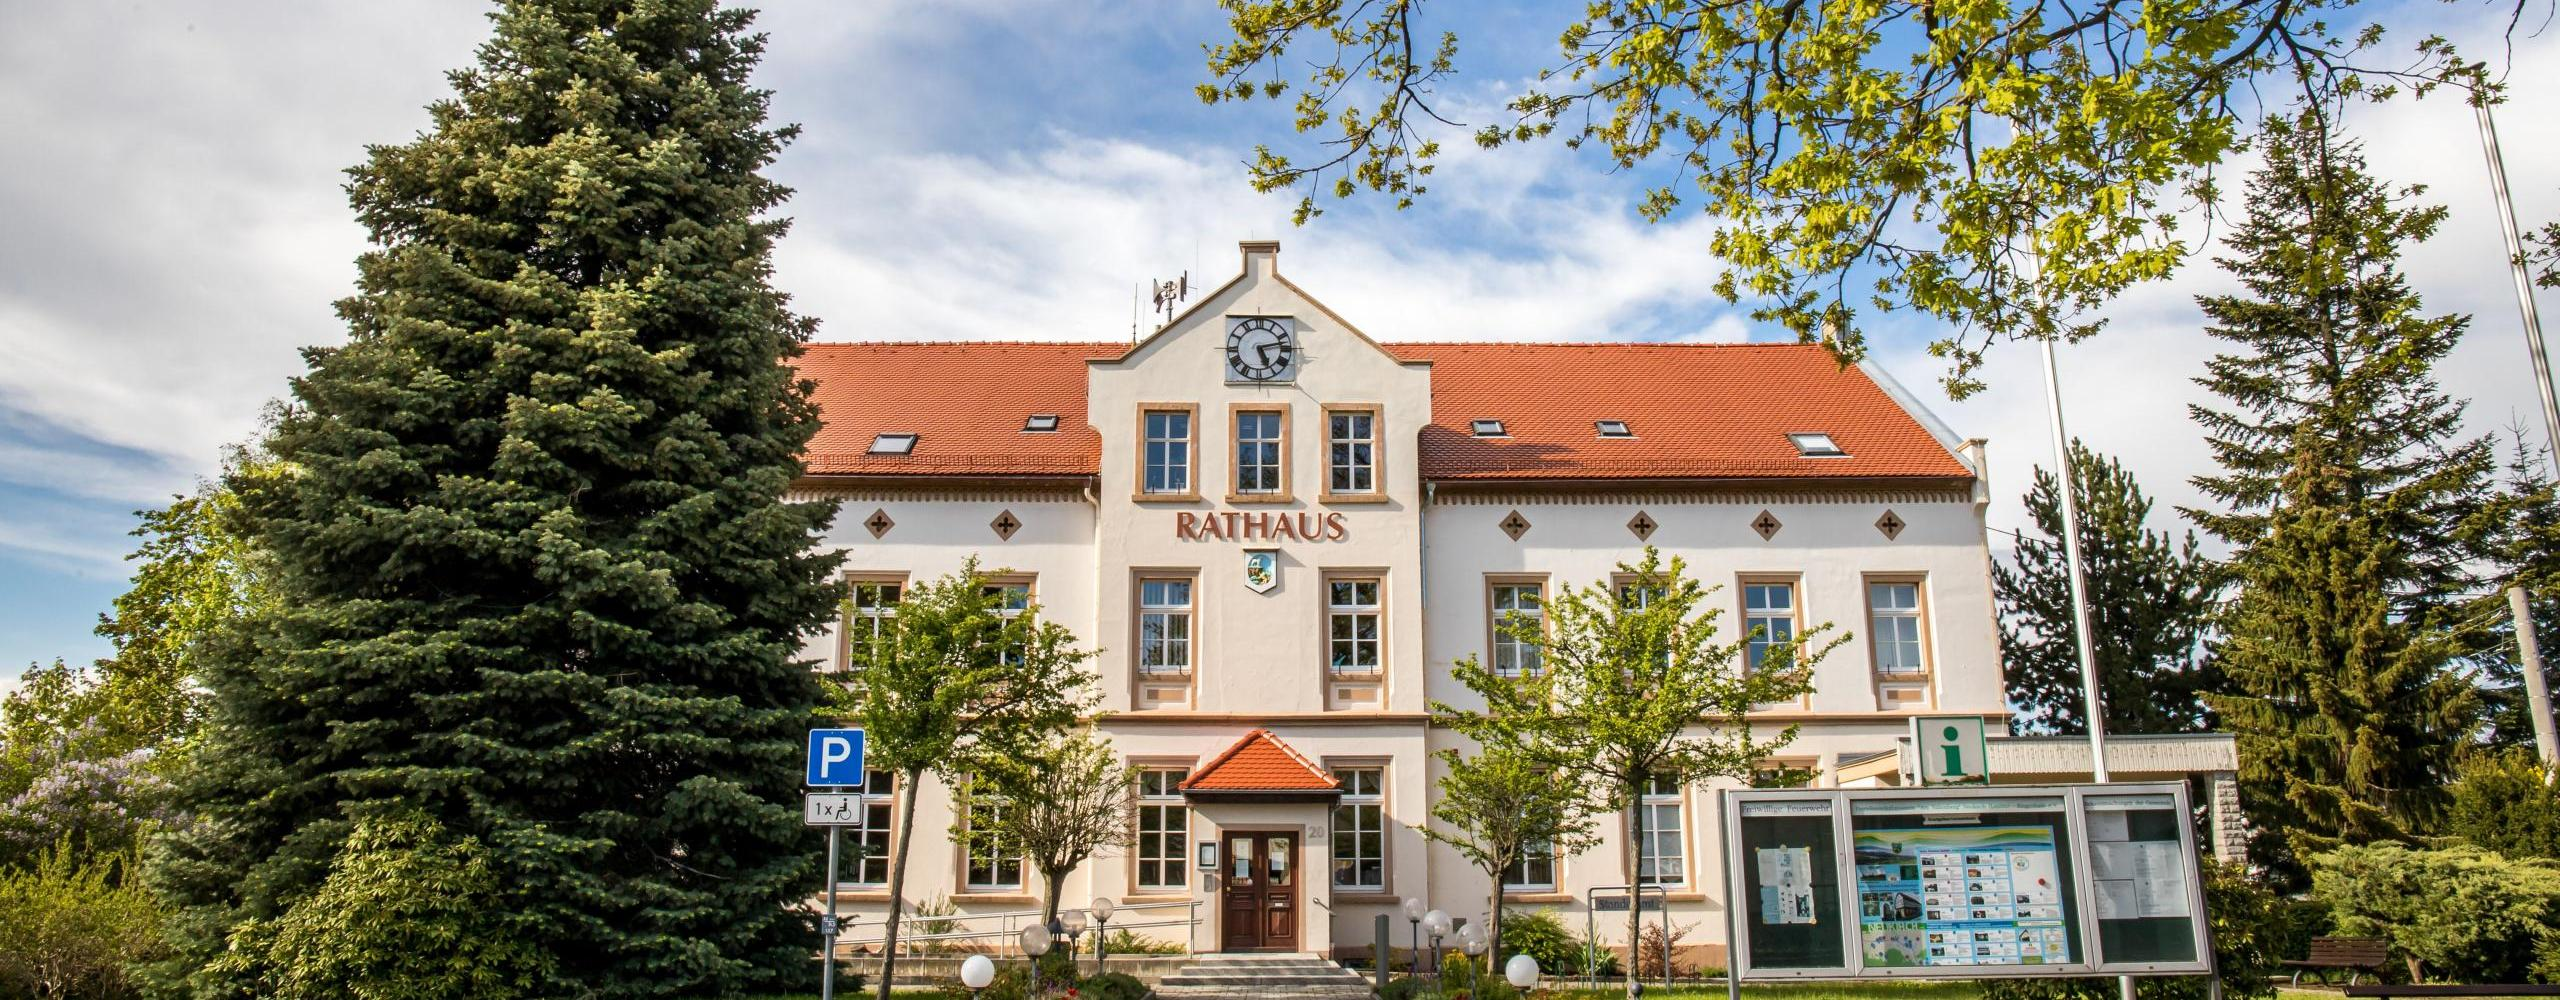 Rathaus ©Rathaus Foto: BAM Image